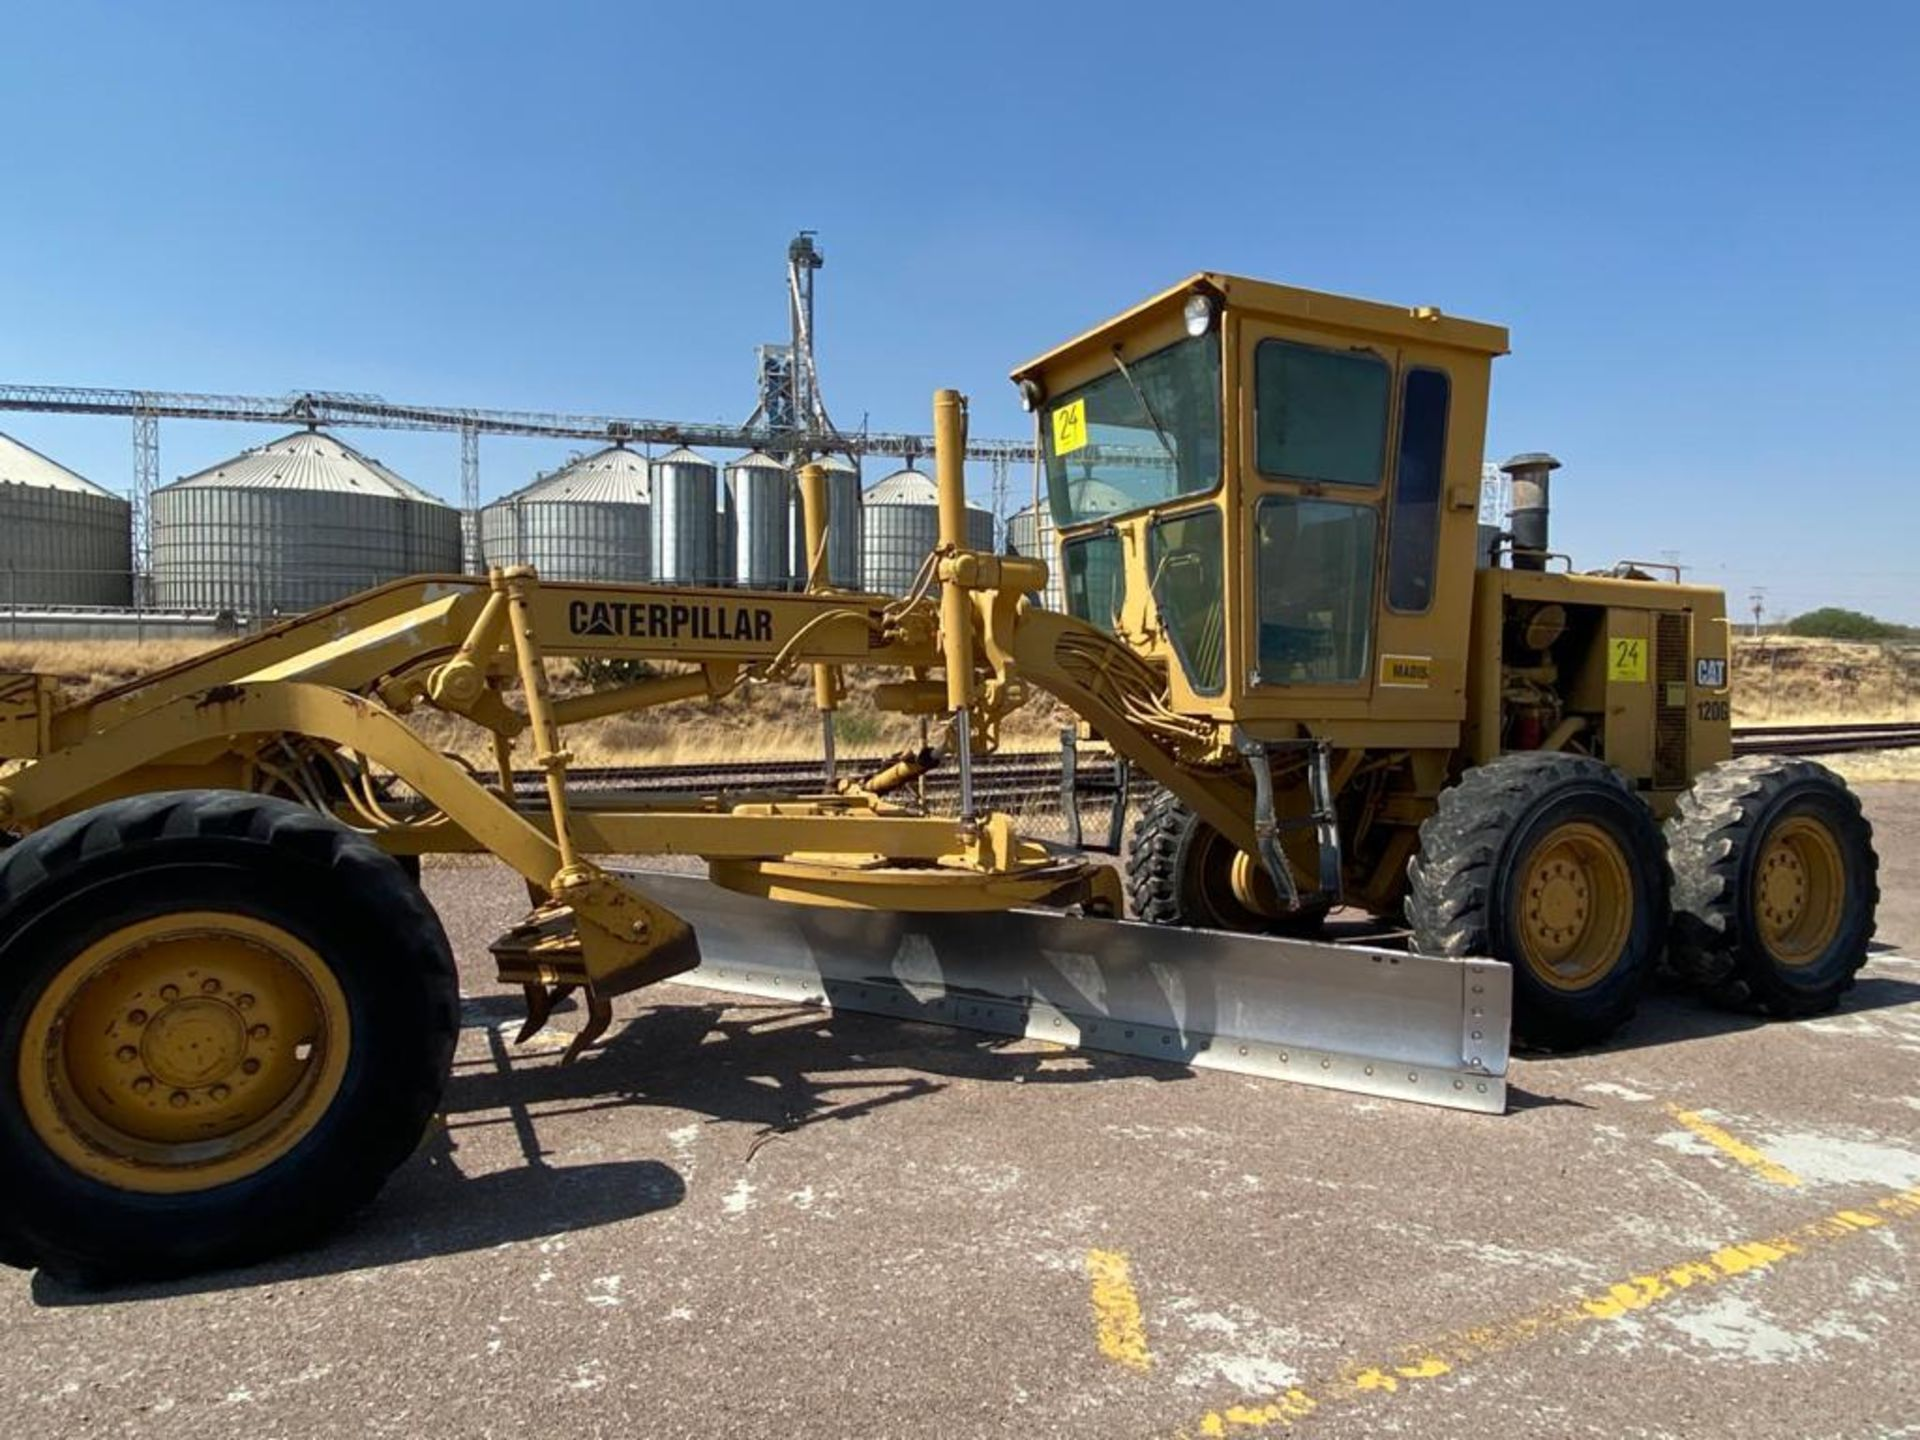 Caterpillar 120G Motor Grader, Serial number 87V09646, Motor number PQ883-2/07Z28983 - Image 8 of 61